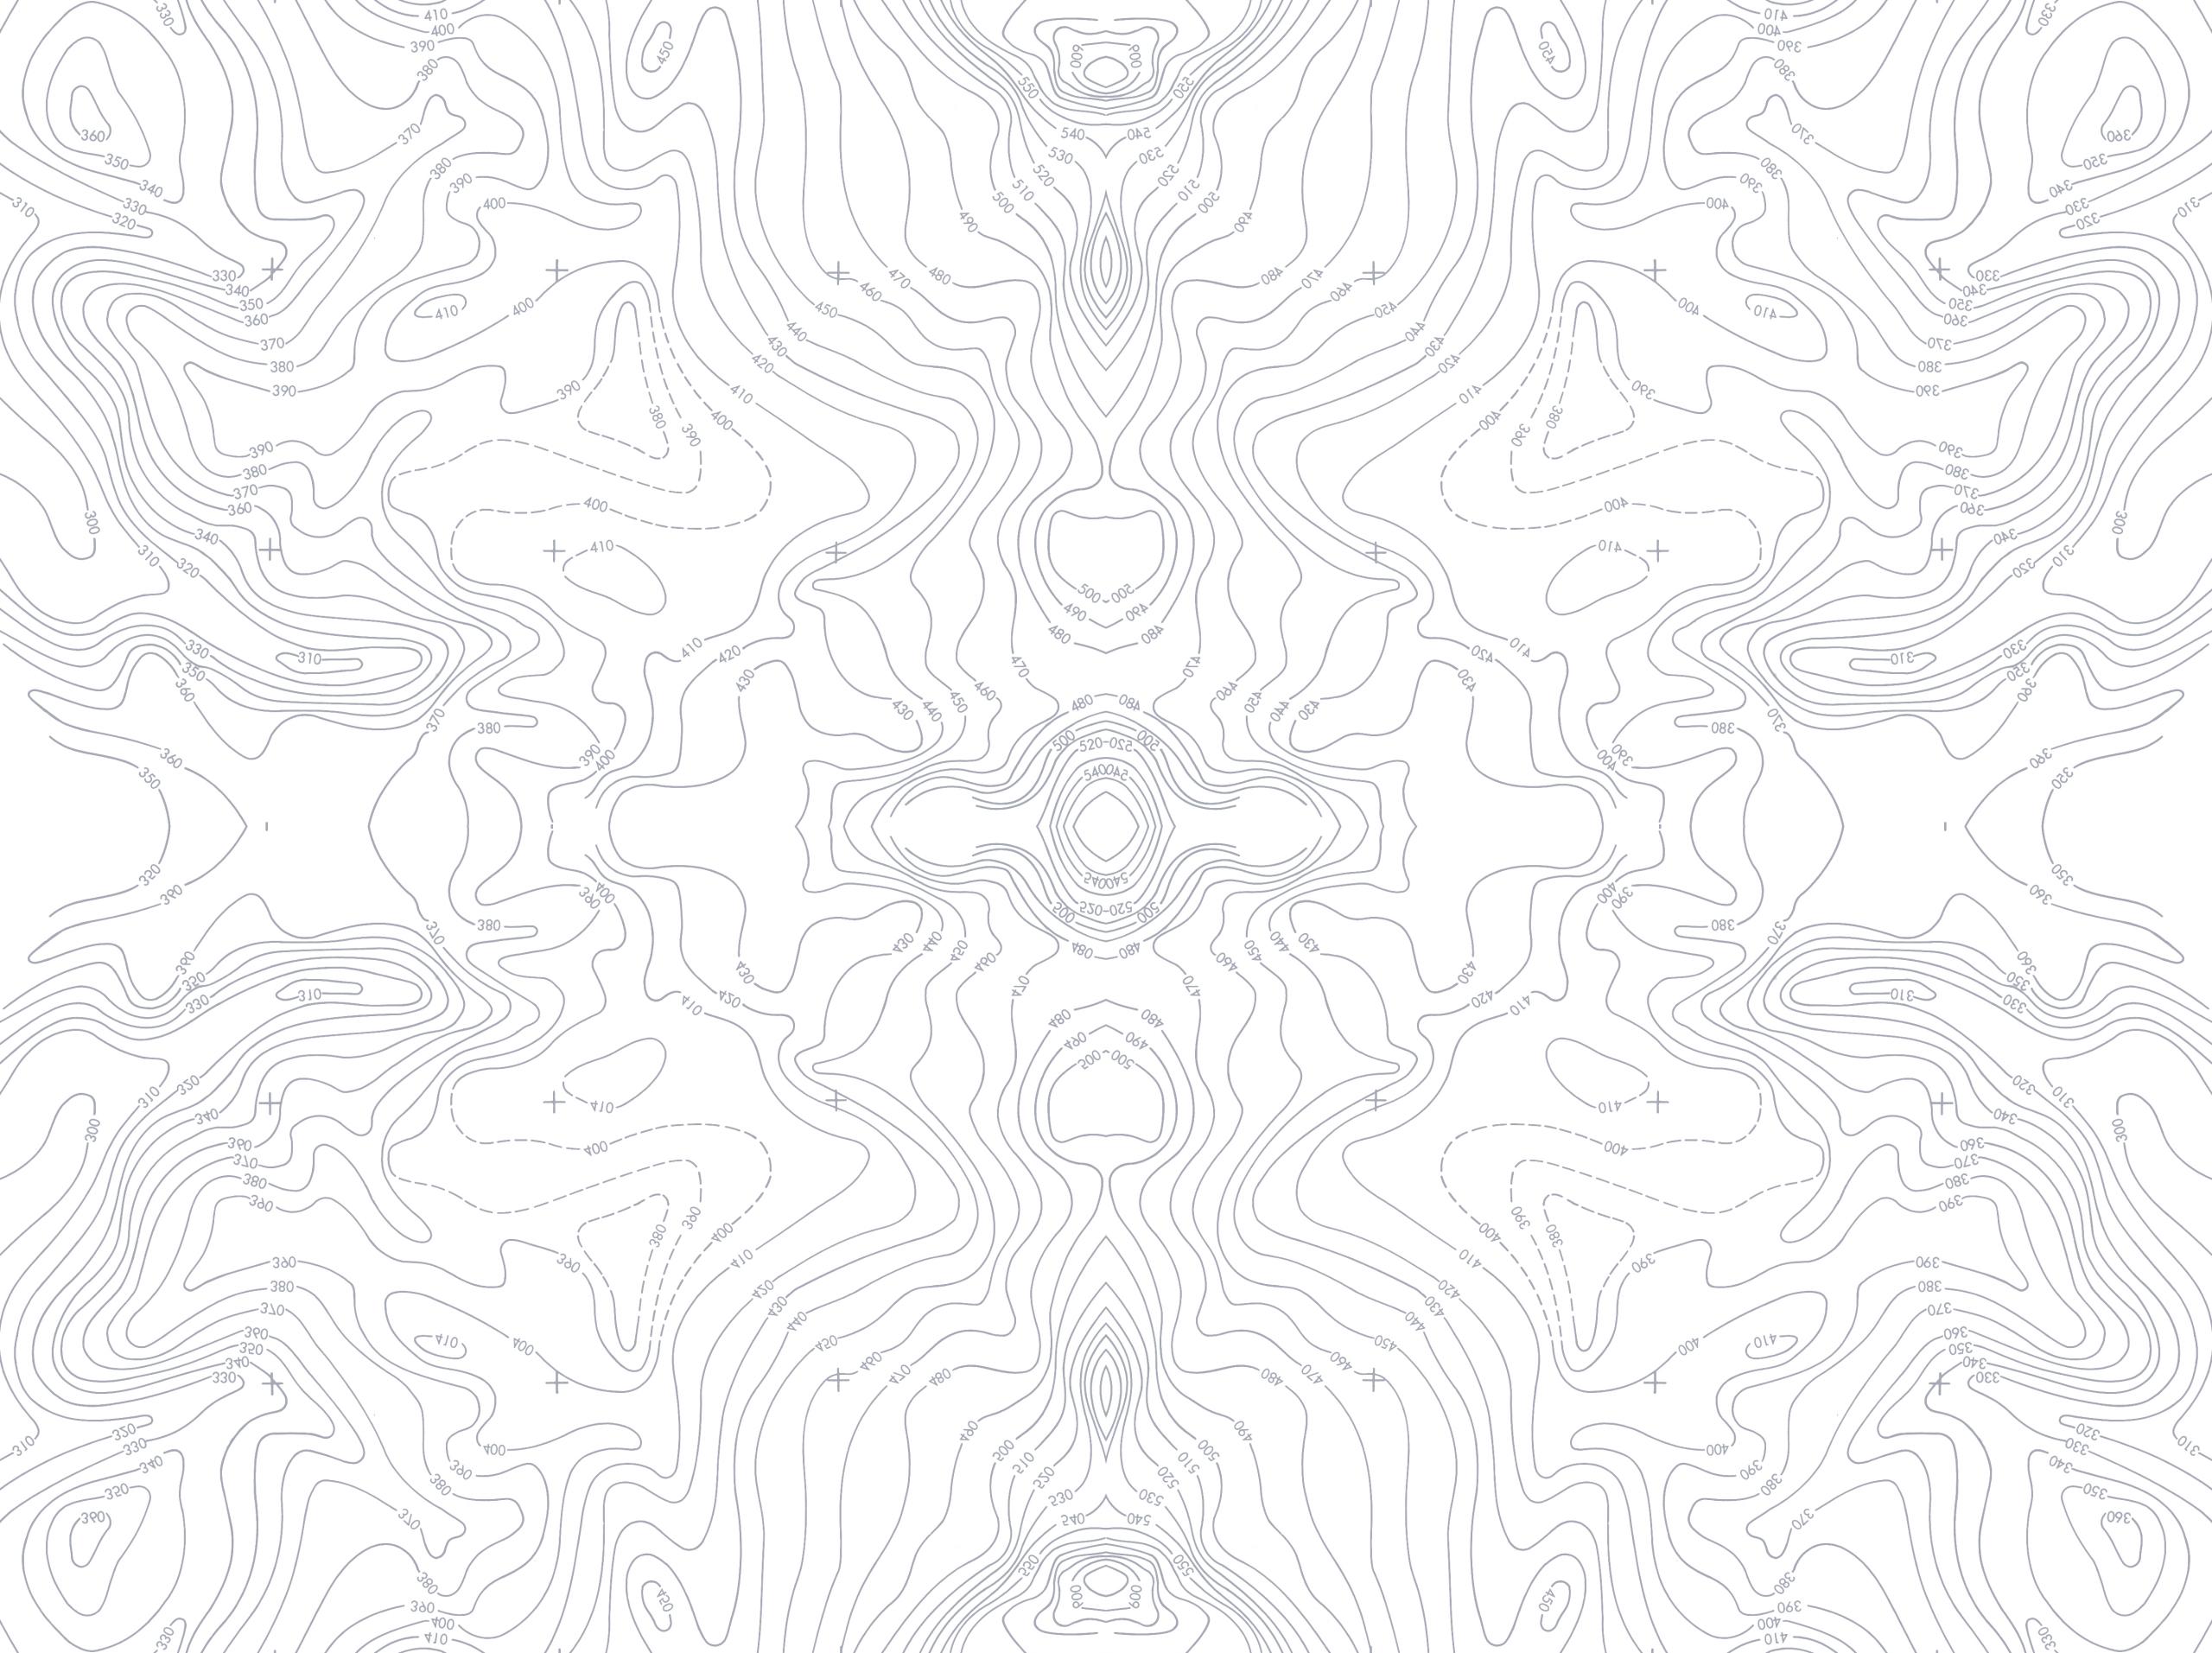 Optimized-contourmapping